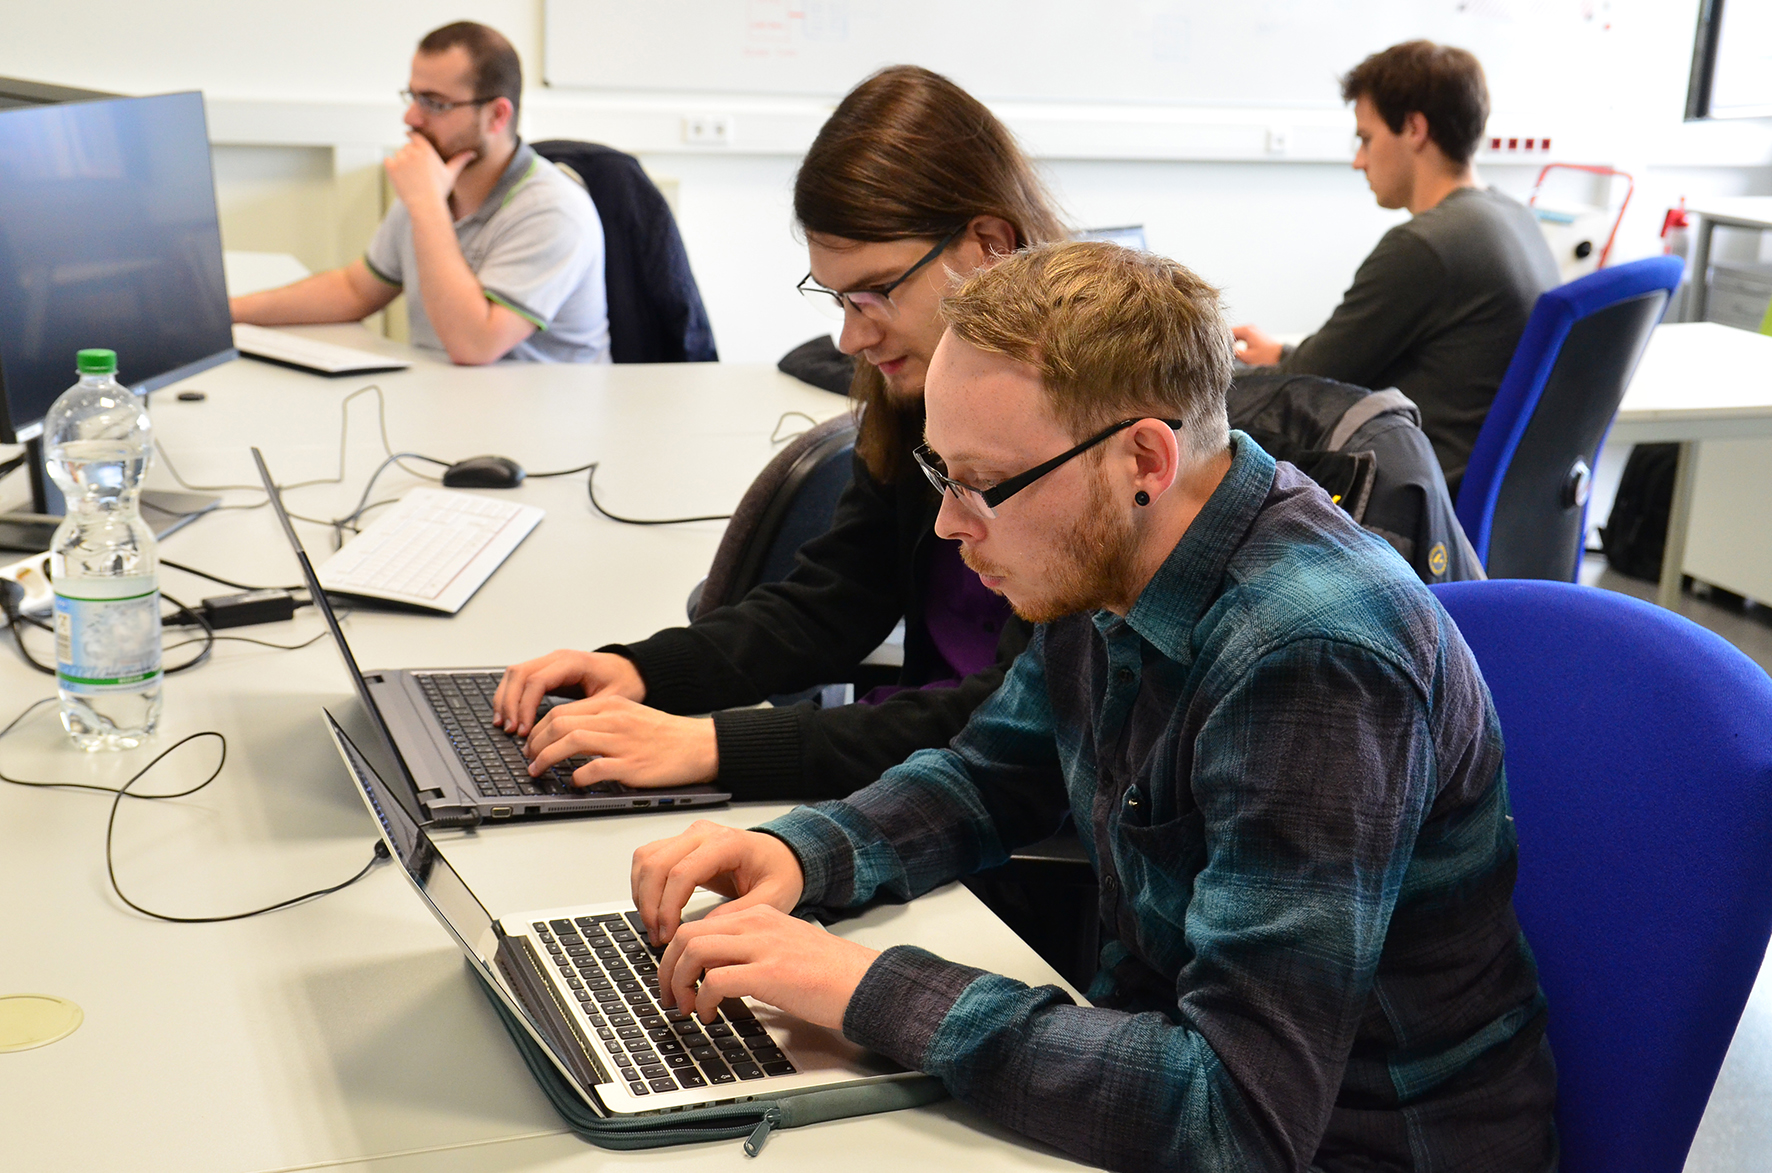 Zwei Studenten vor Laptops